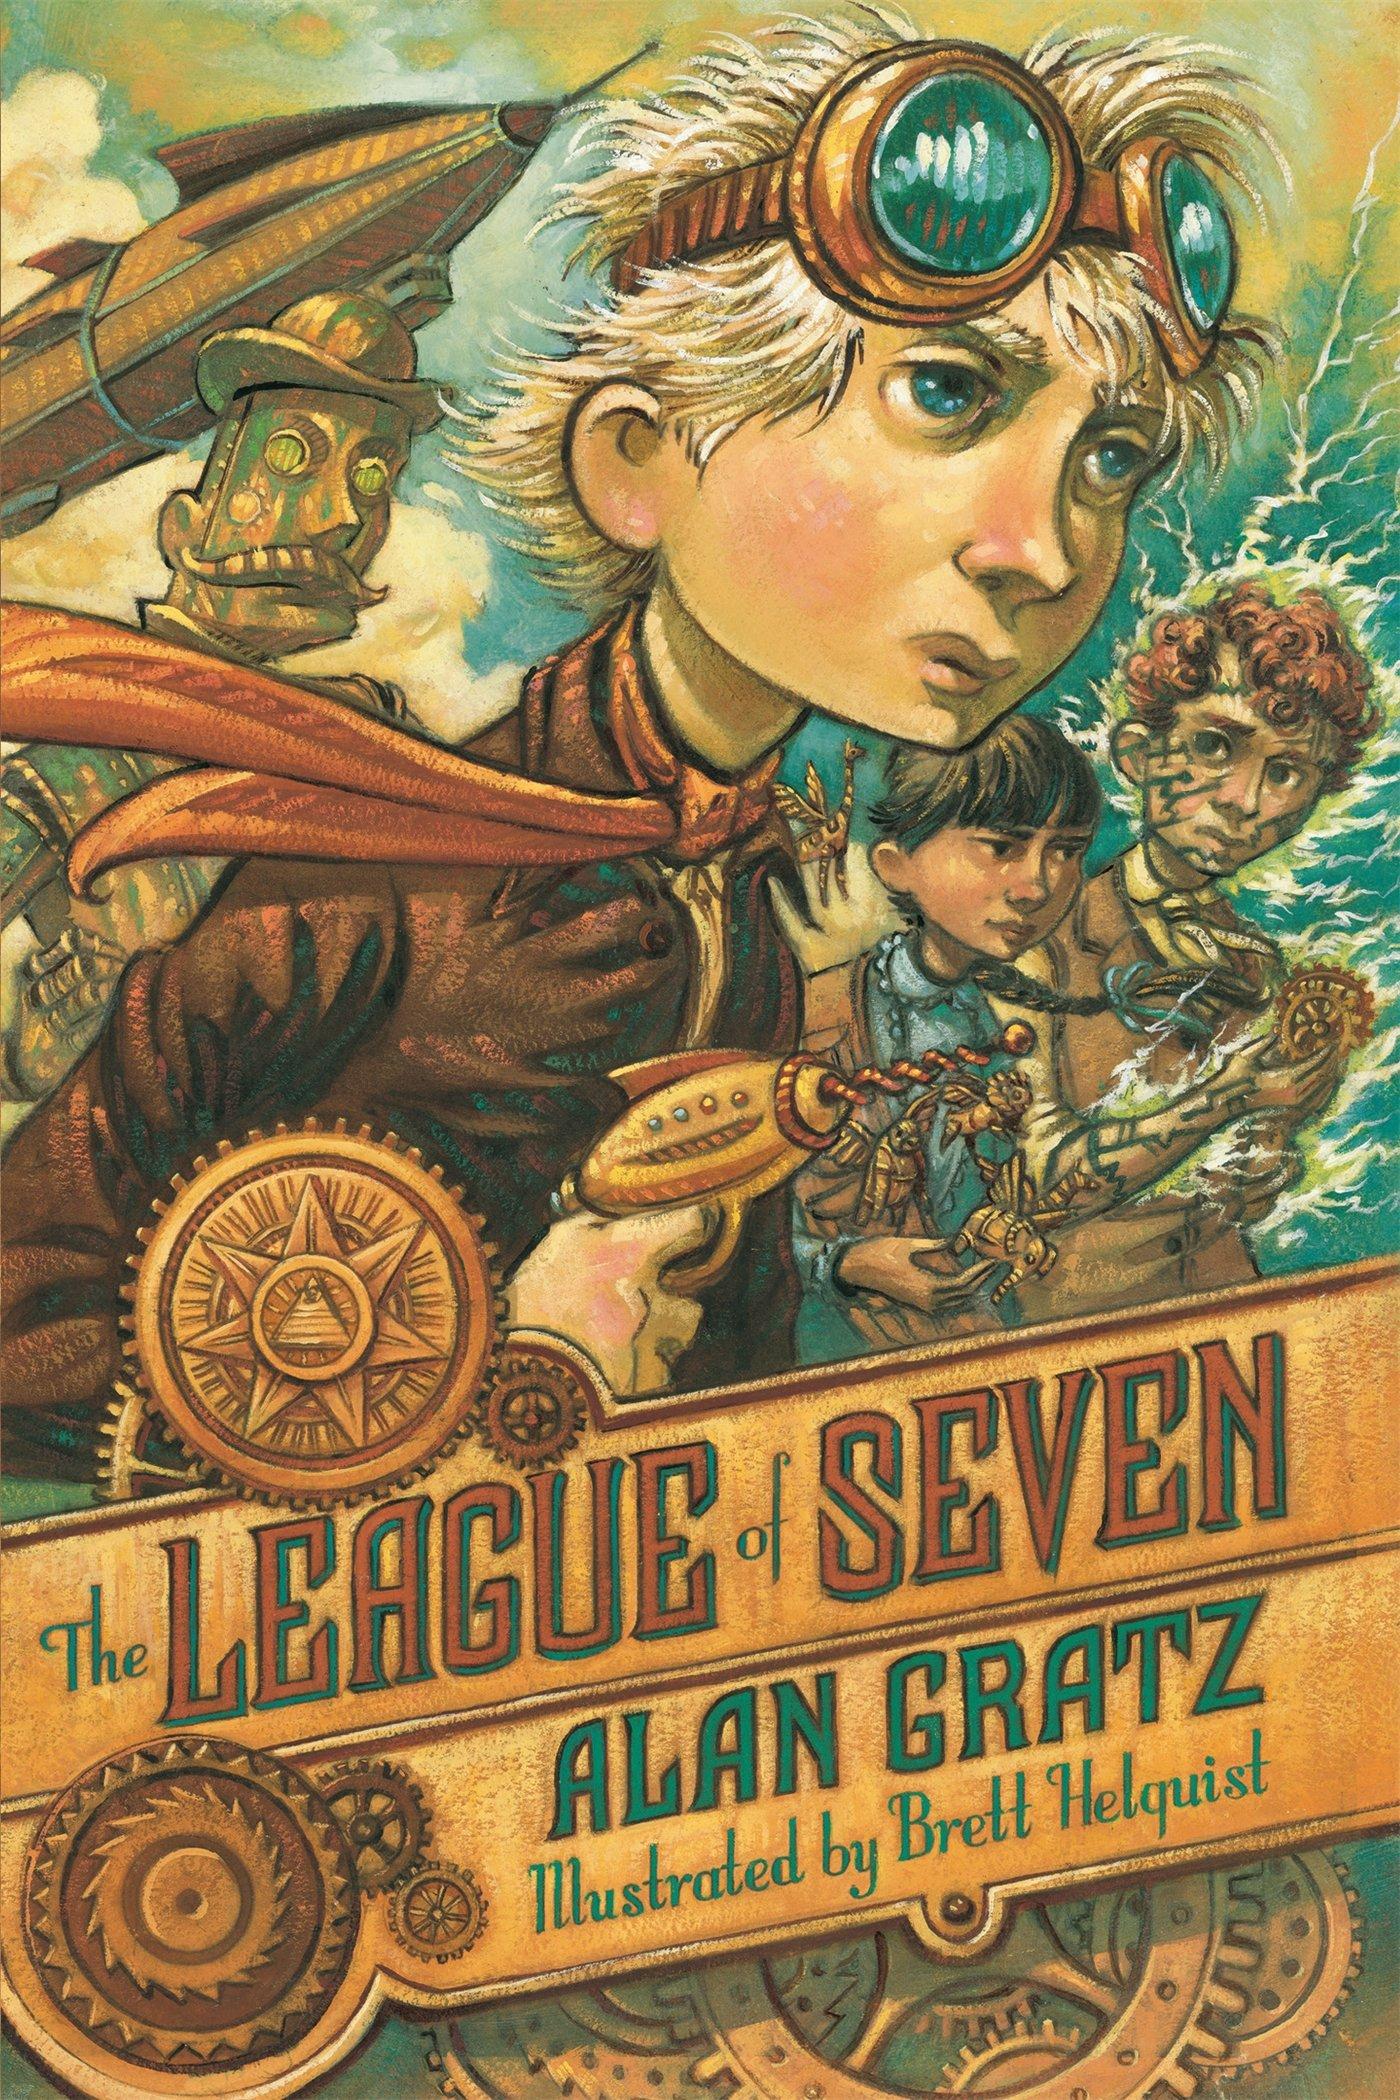 Amazon: The League Of Seven (9780765338259): Alan Gratz, Brett  Helquist: Books